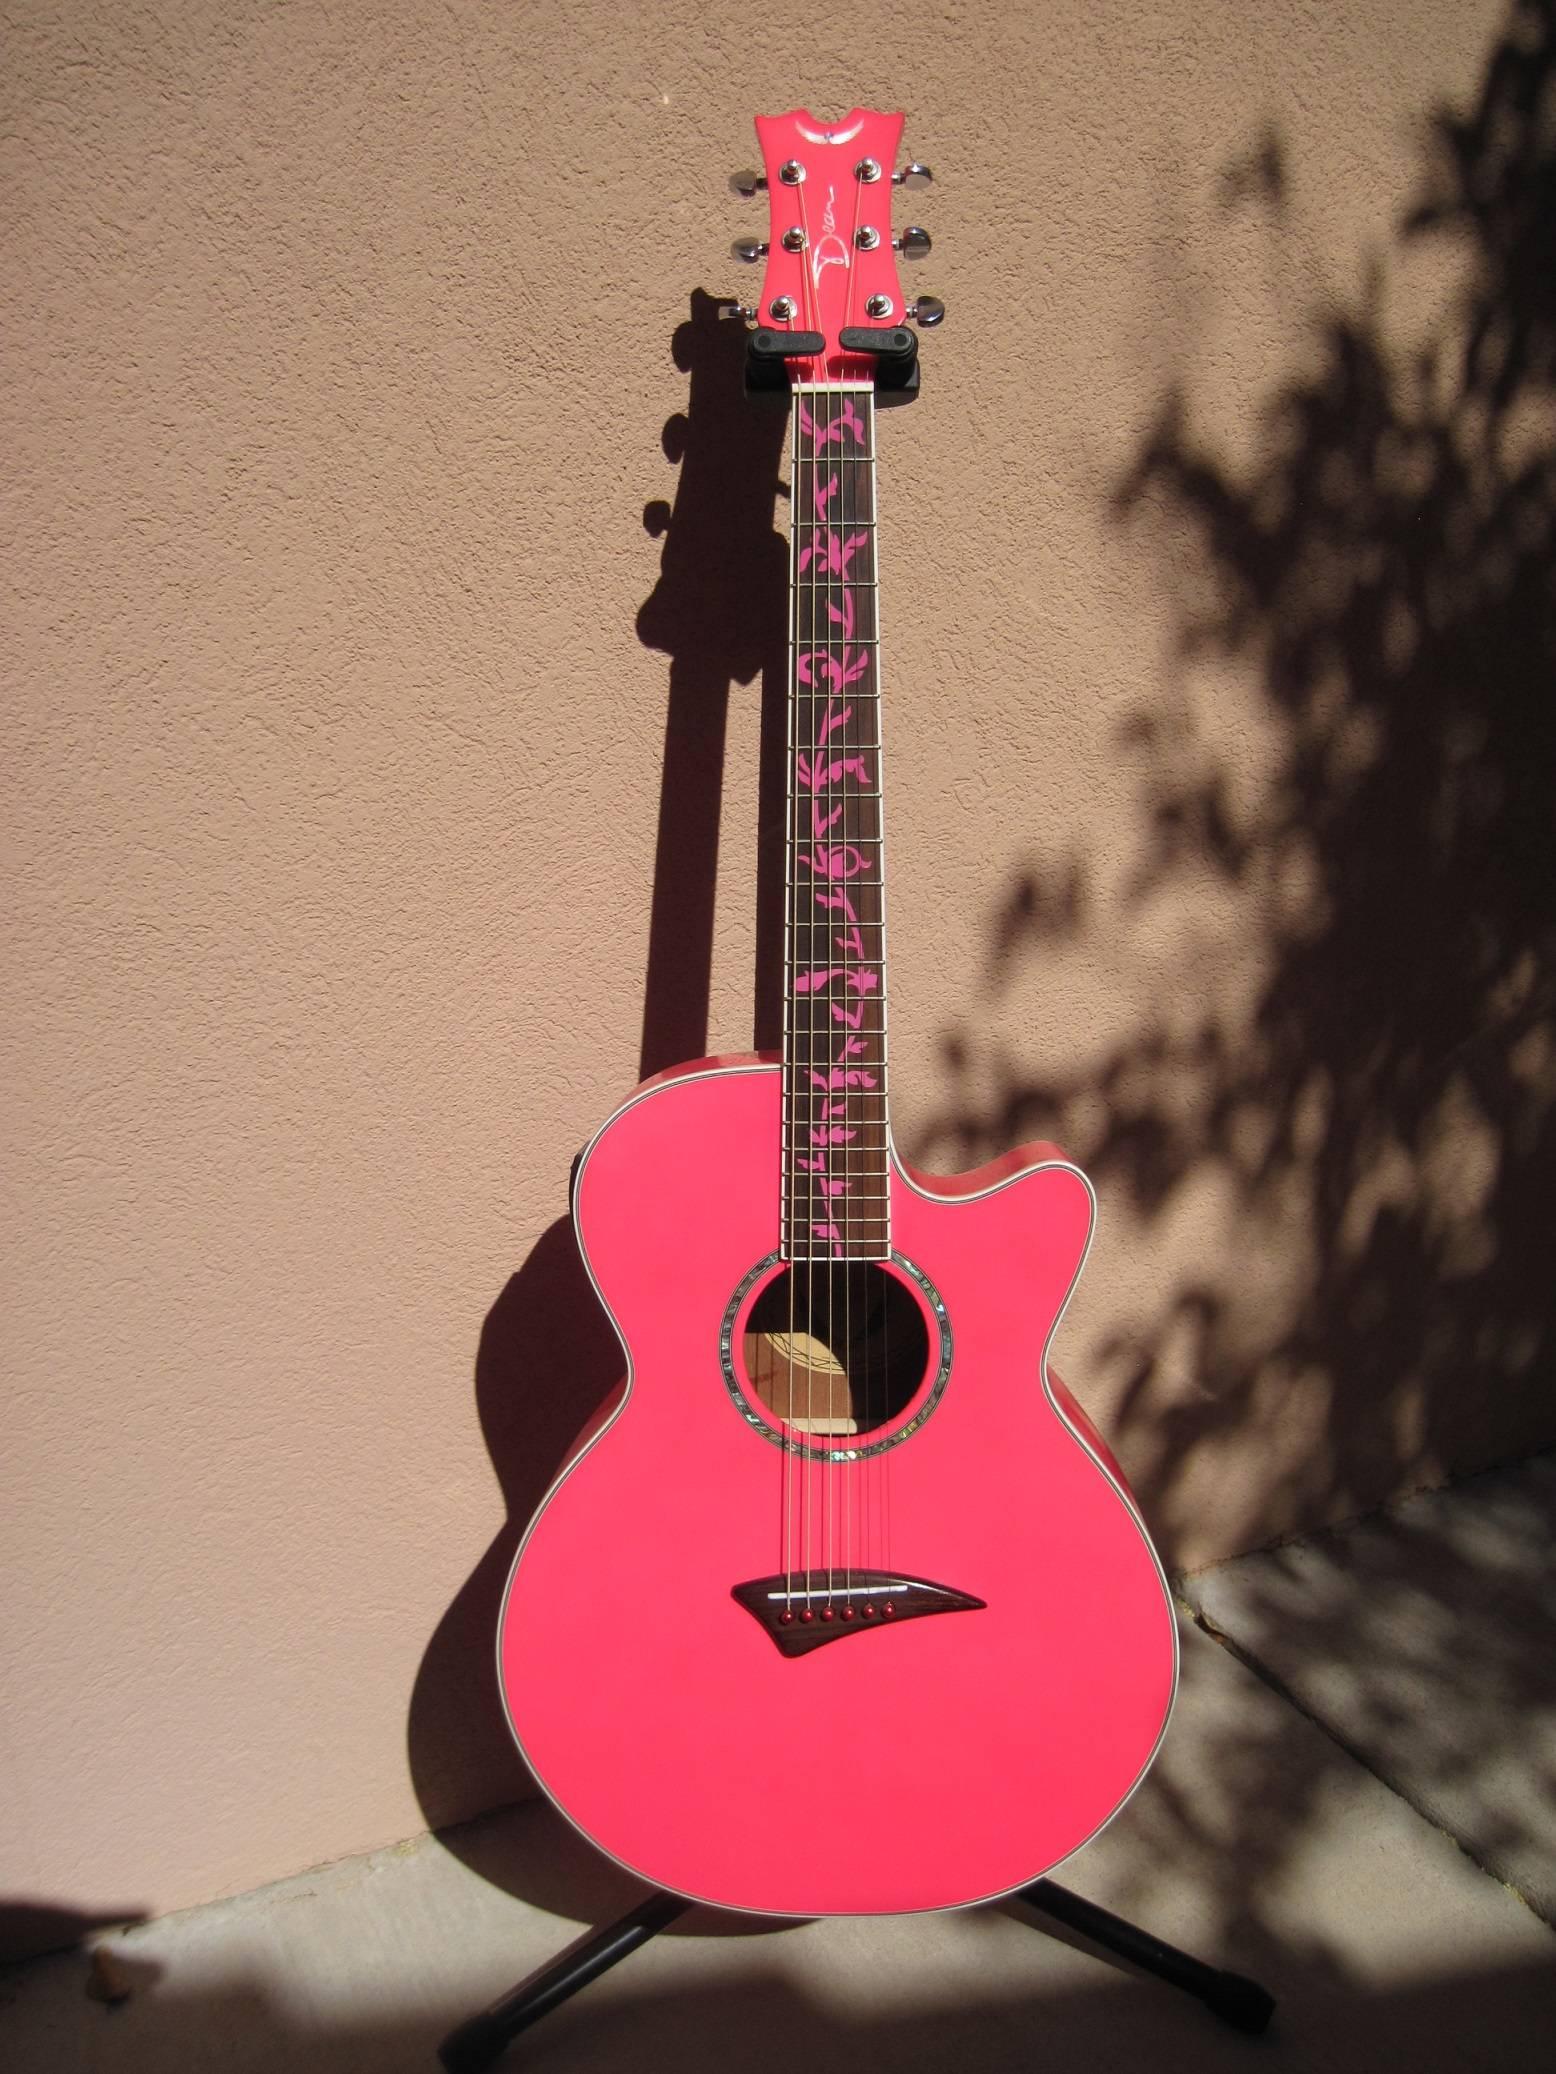 2013 Dean Performer E Acoustic-Electric Guitar